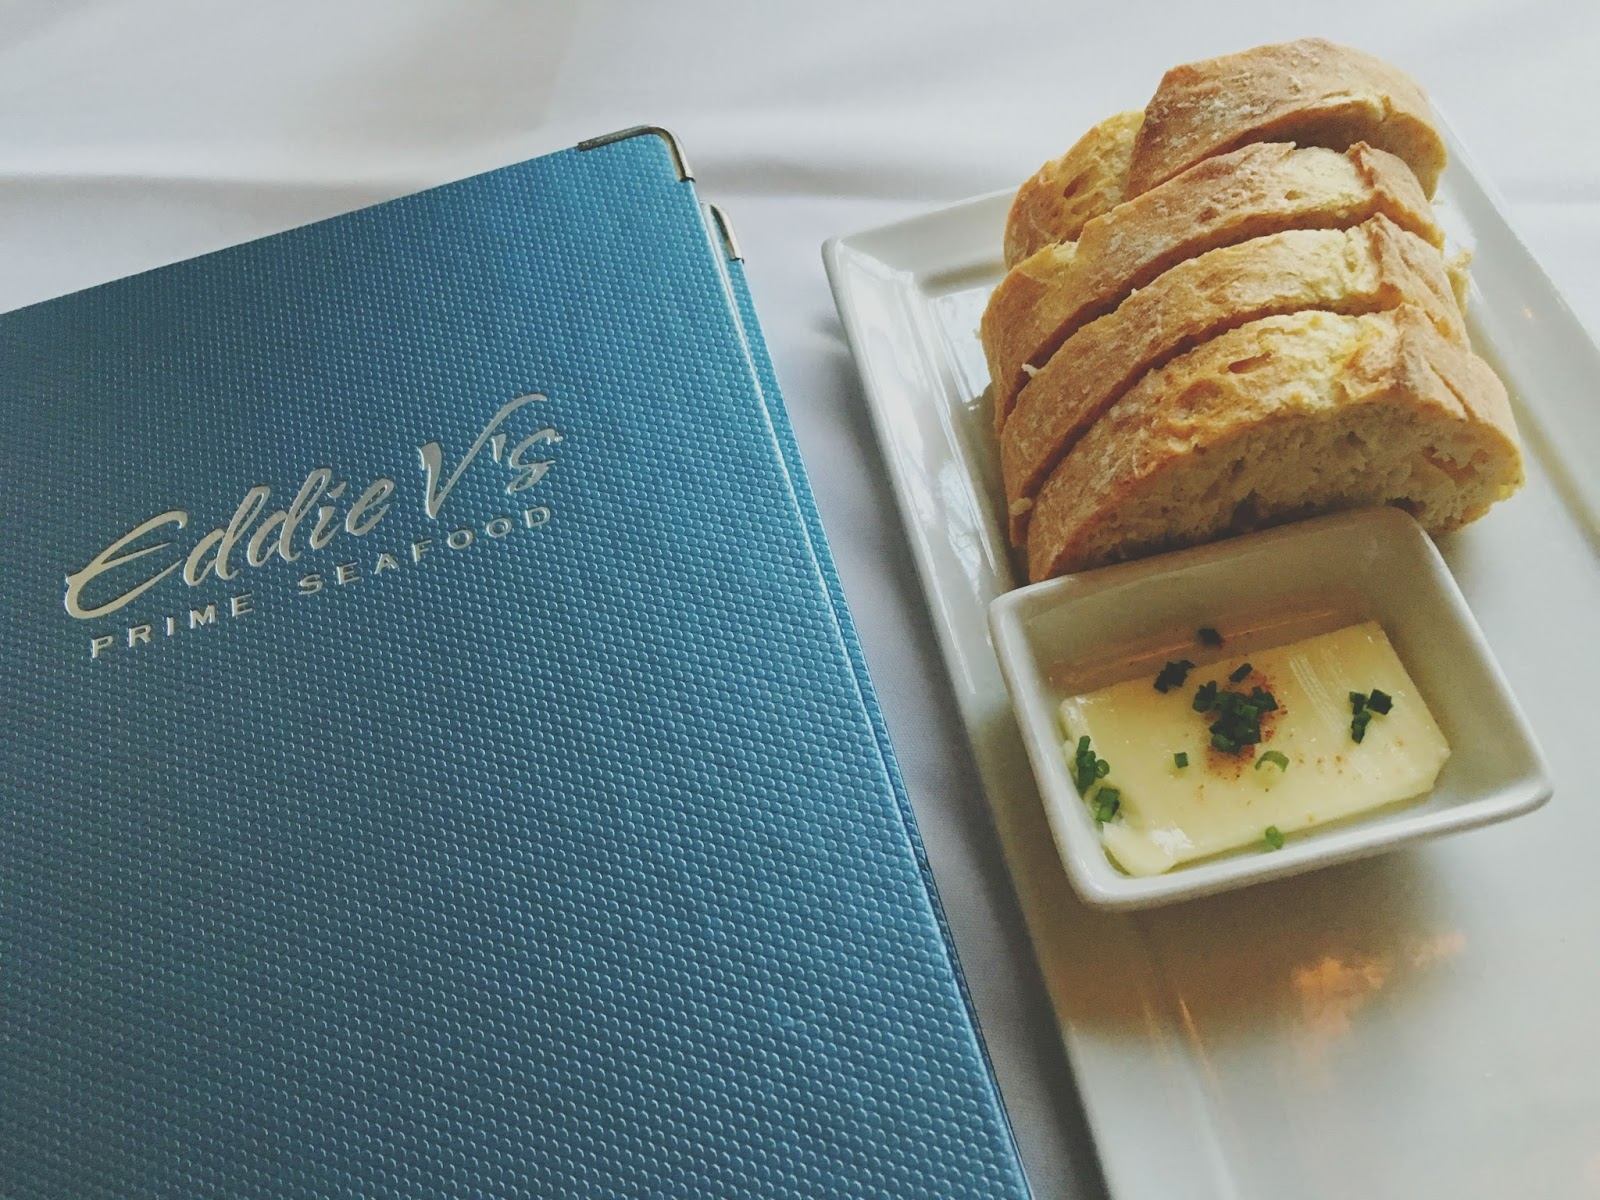 bread at Eddie V's - A restaurant in Houston, Texas